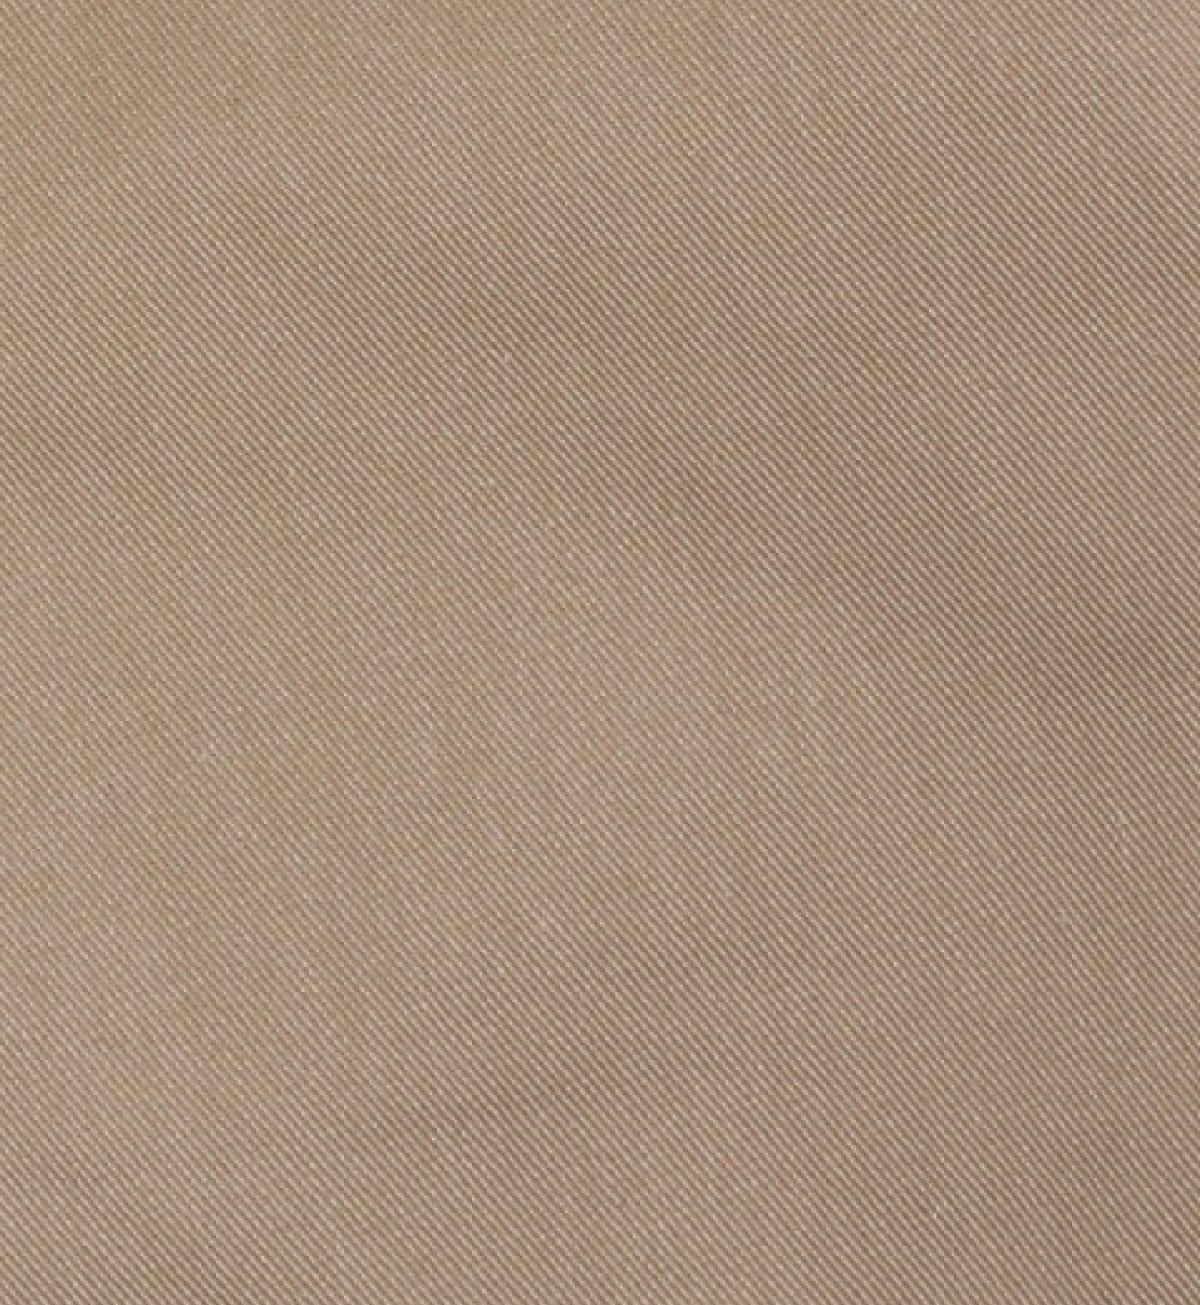 Pembrook Men's Full Elastic Waist Twill Casual Pant - L - Tan by Pembrook (Image #2)